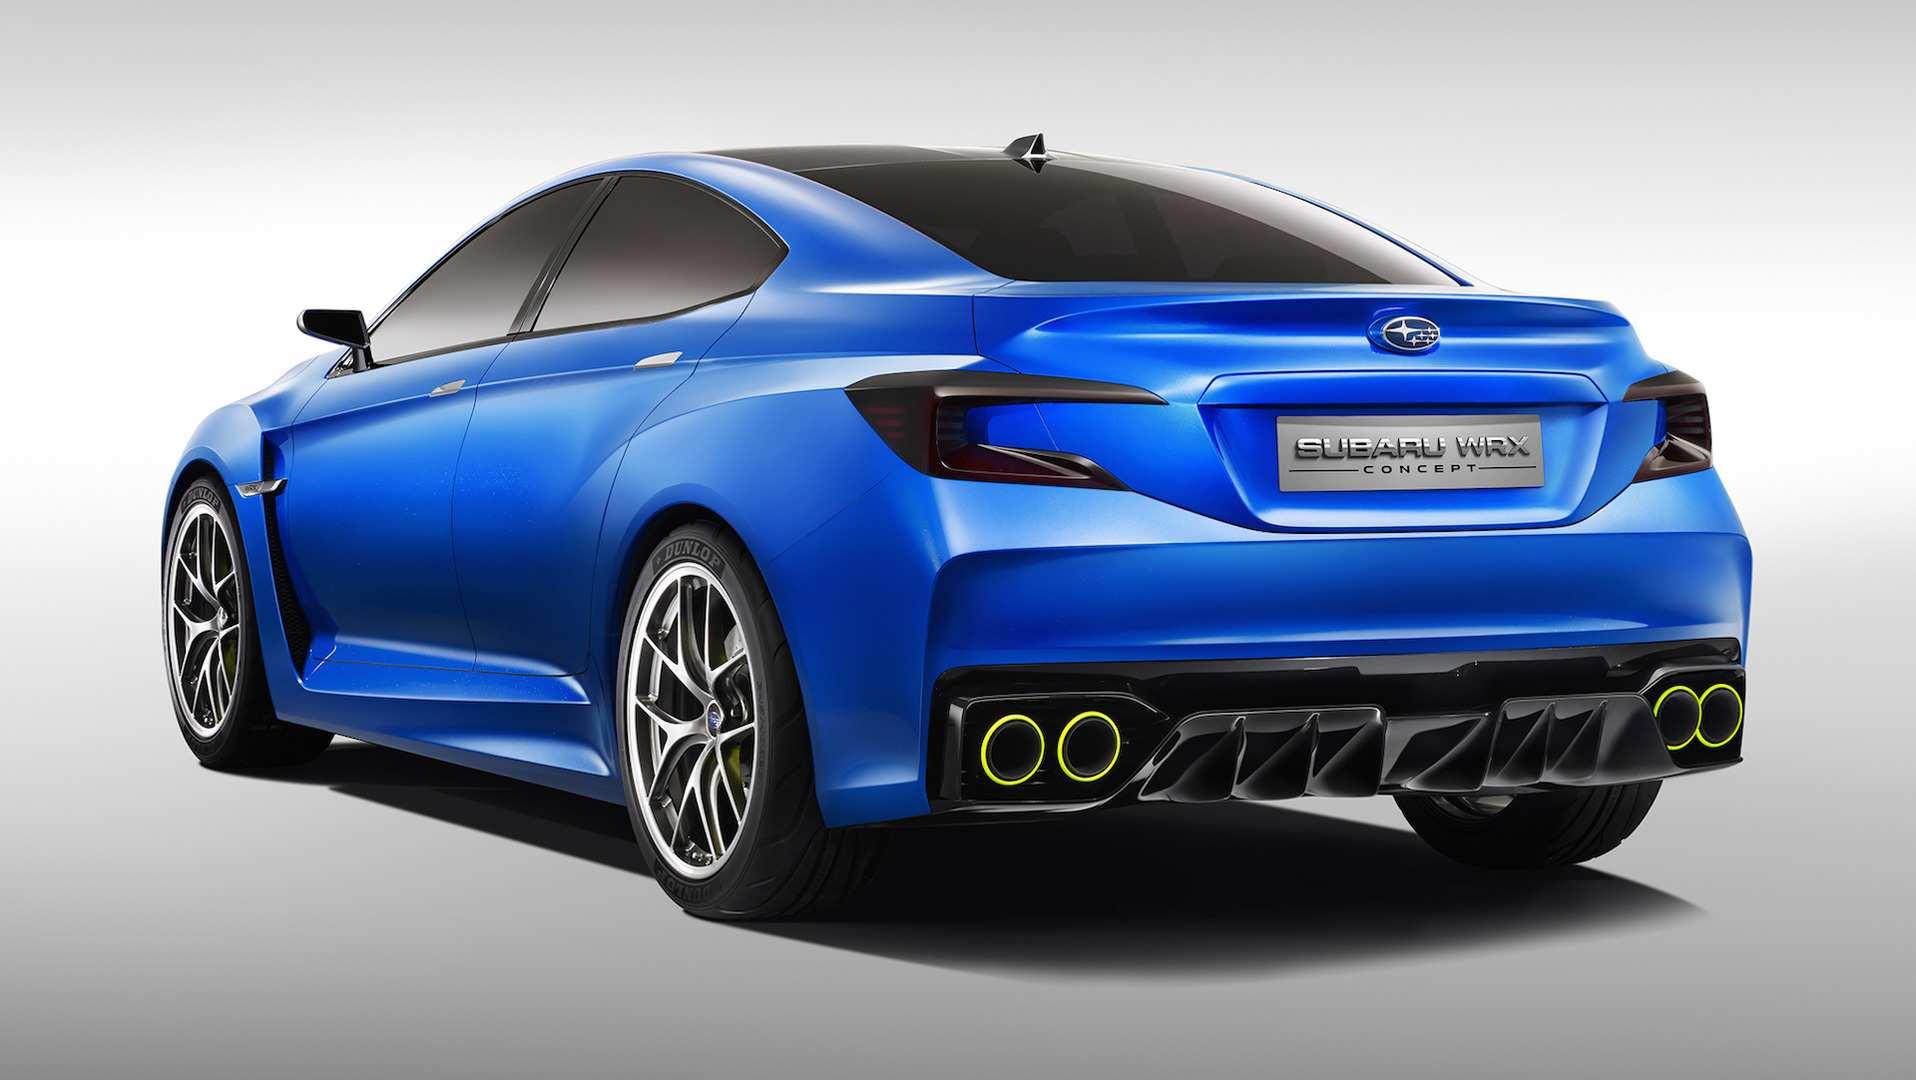 13 Concept of 2020 Subaru Impreza Wrx Sti Release Date by 2020 Subaru Impreza Wrx Sti